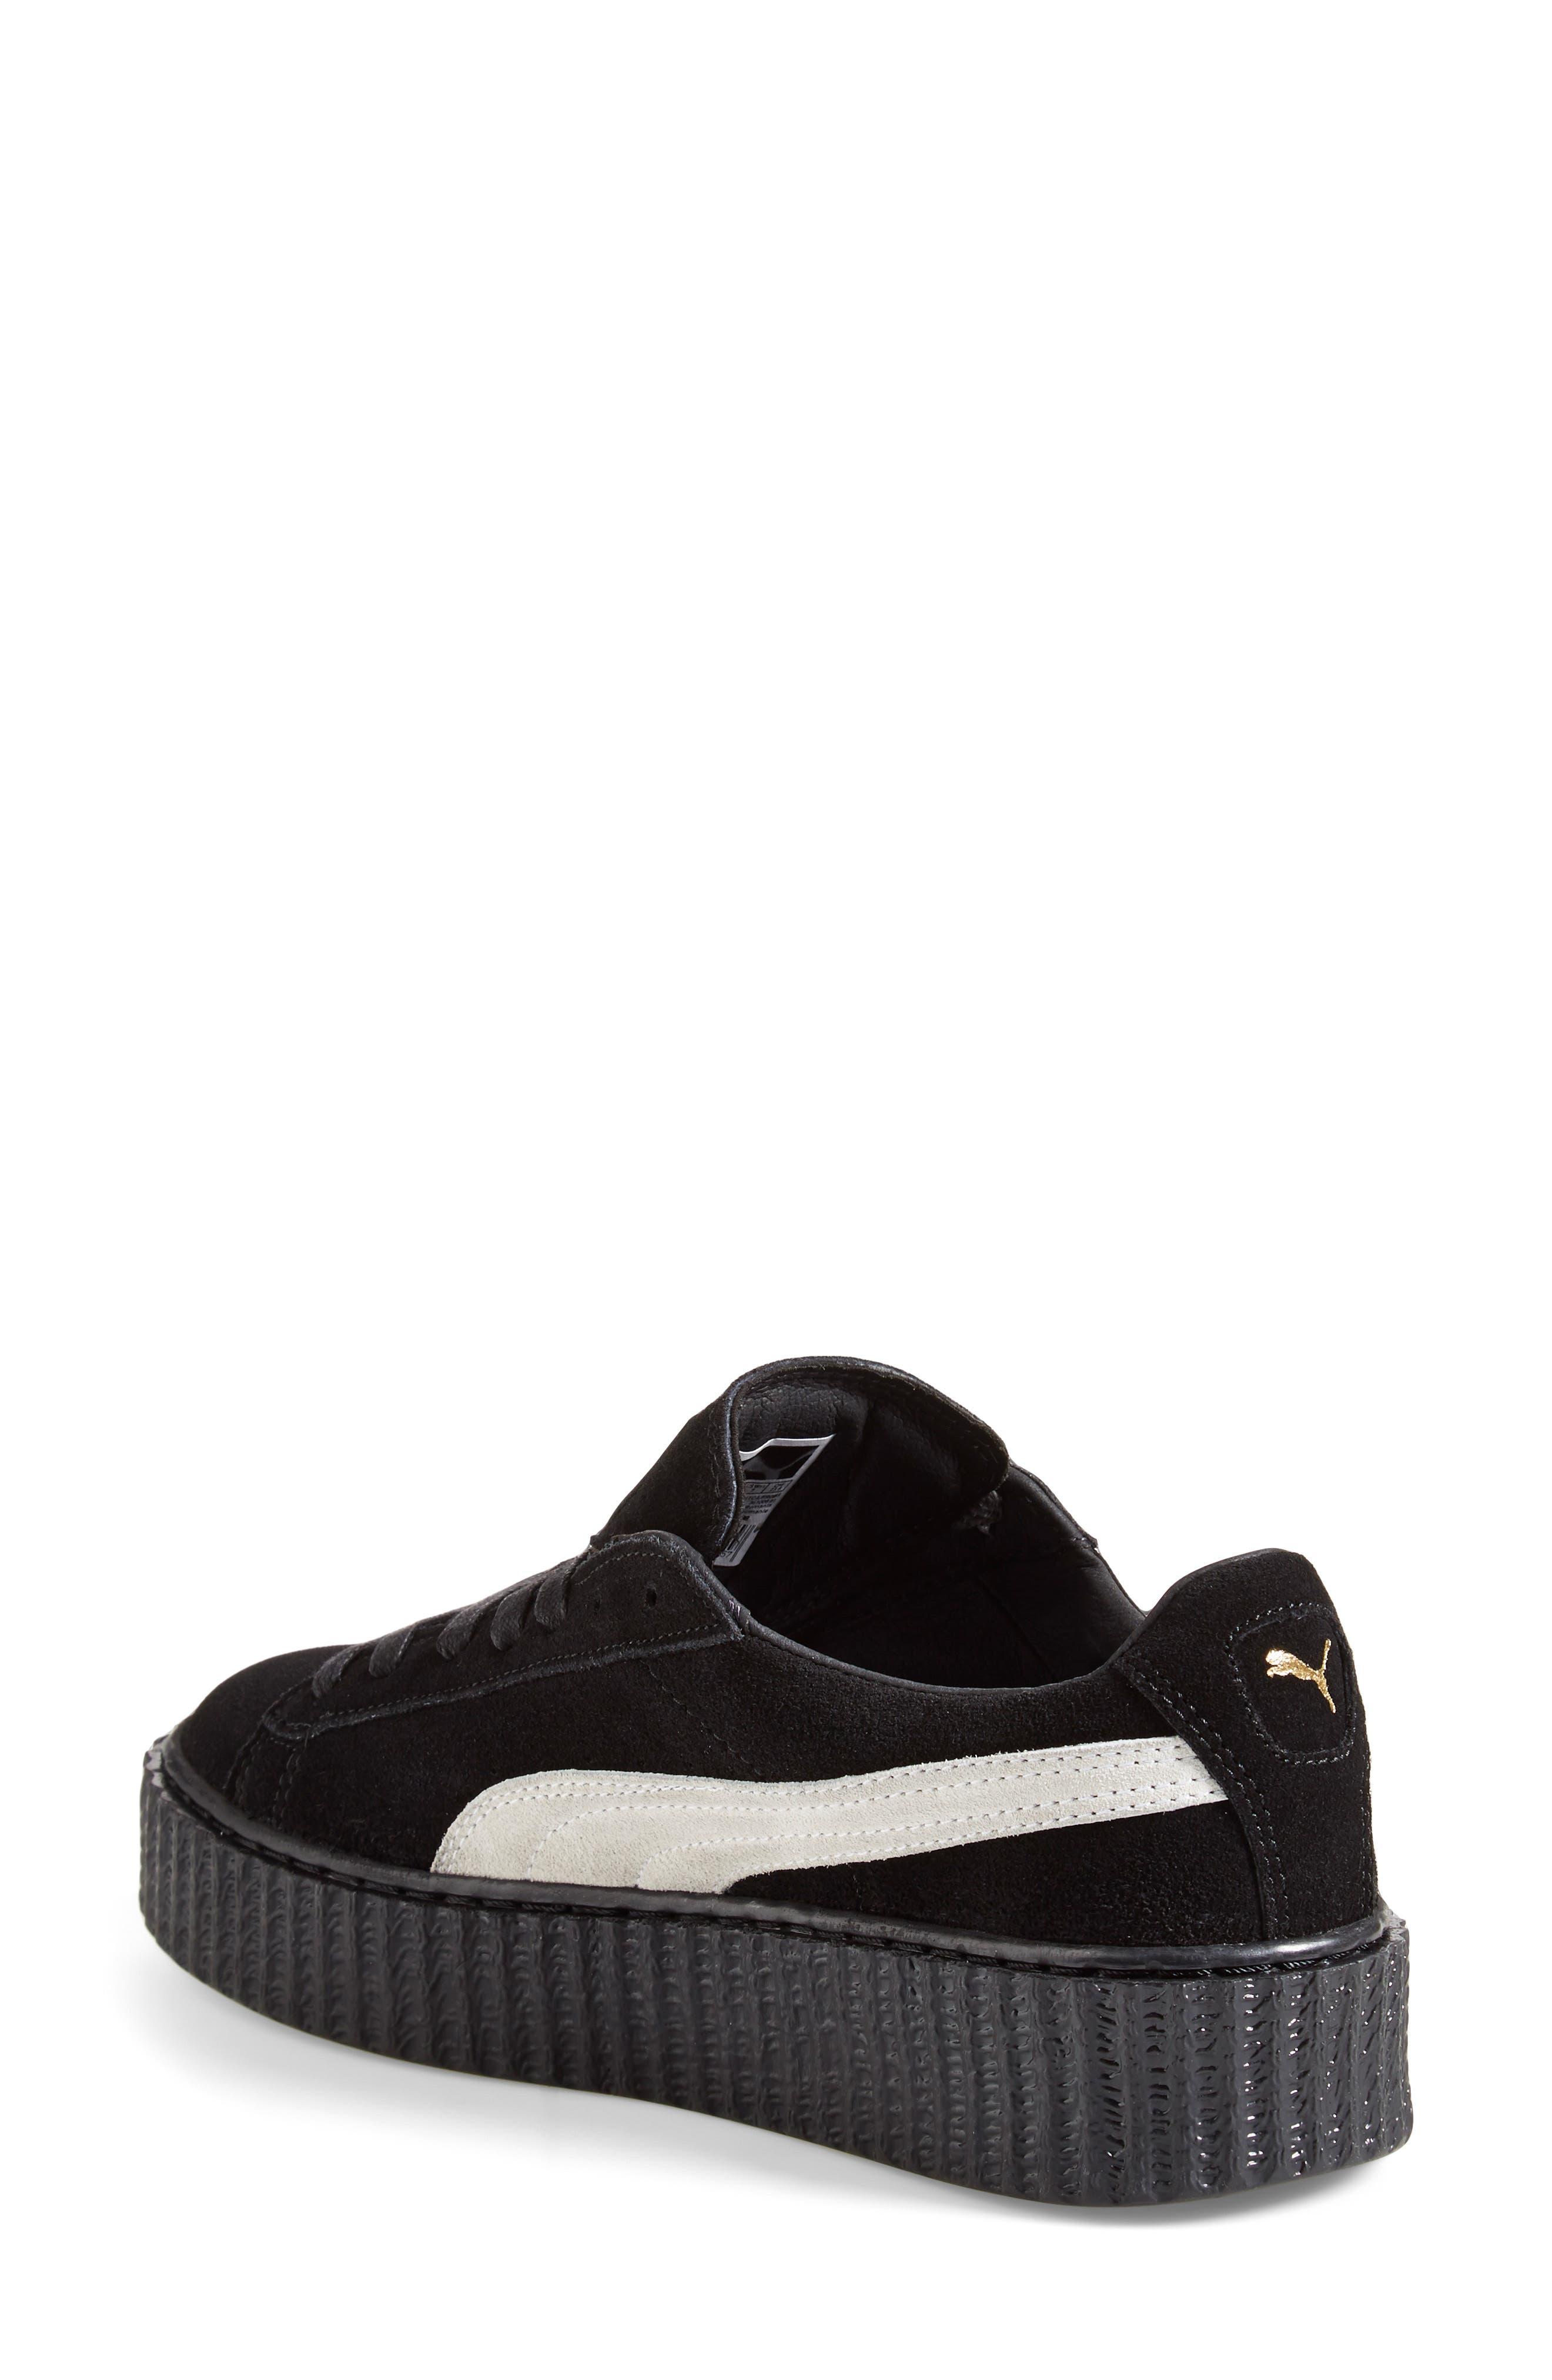 PUMA, FENTY PUMA by Rihanna Creeper Sneaker, Alternate thumbnail 2, color, 001